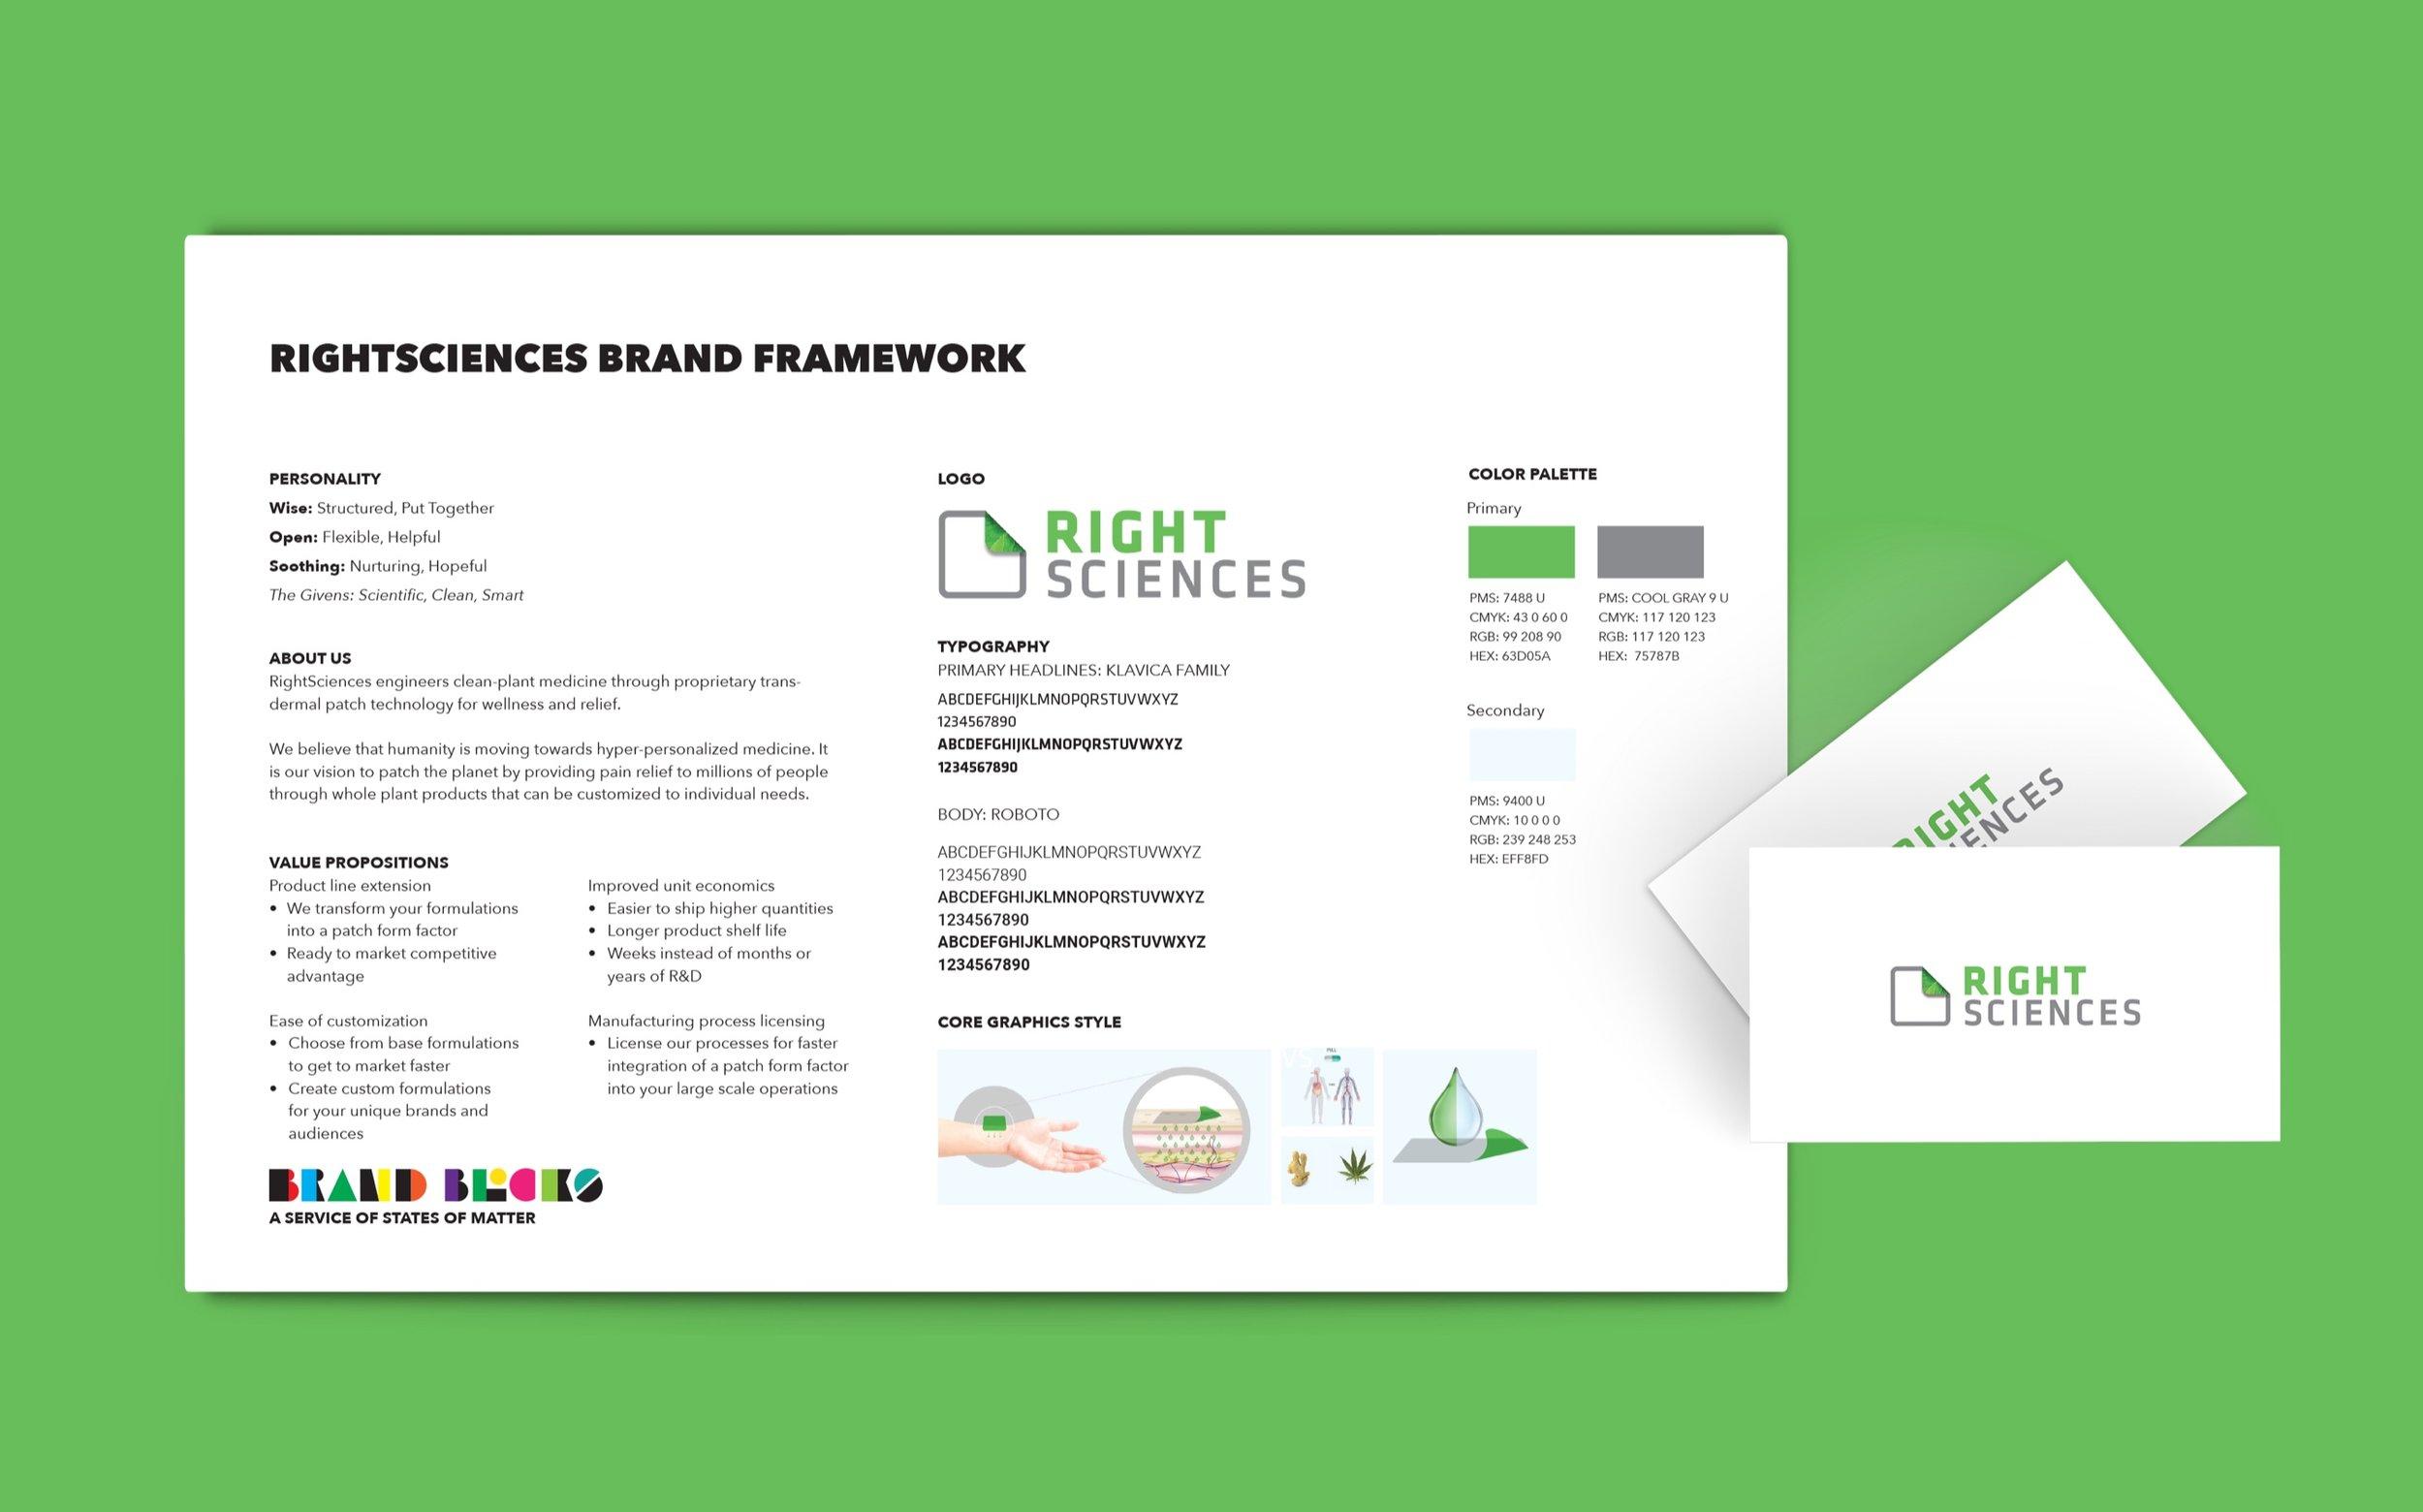 rightsciences_brand_guidelines@2x.jpg